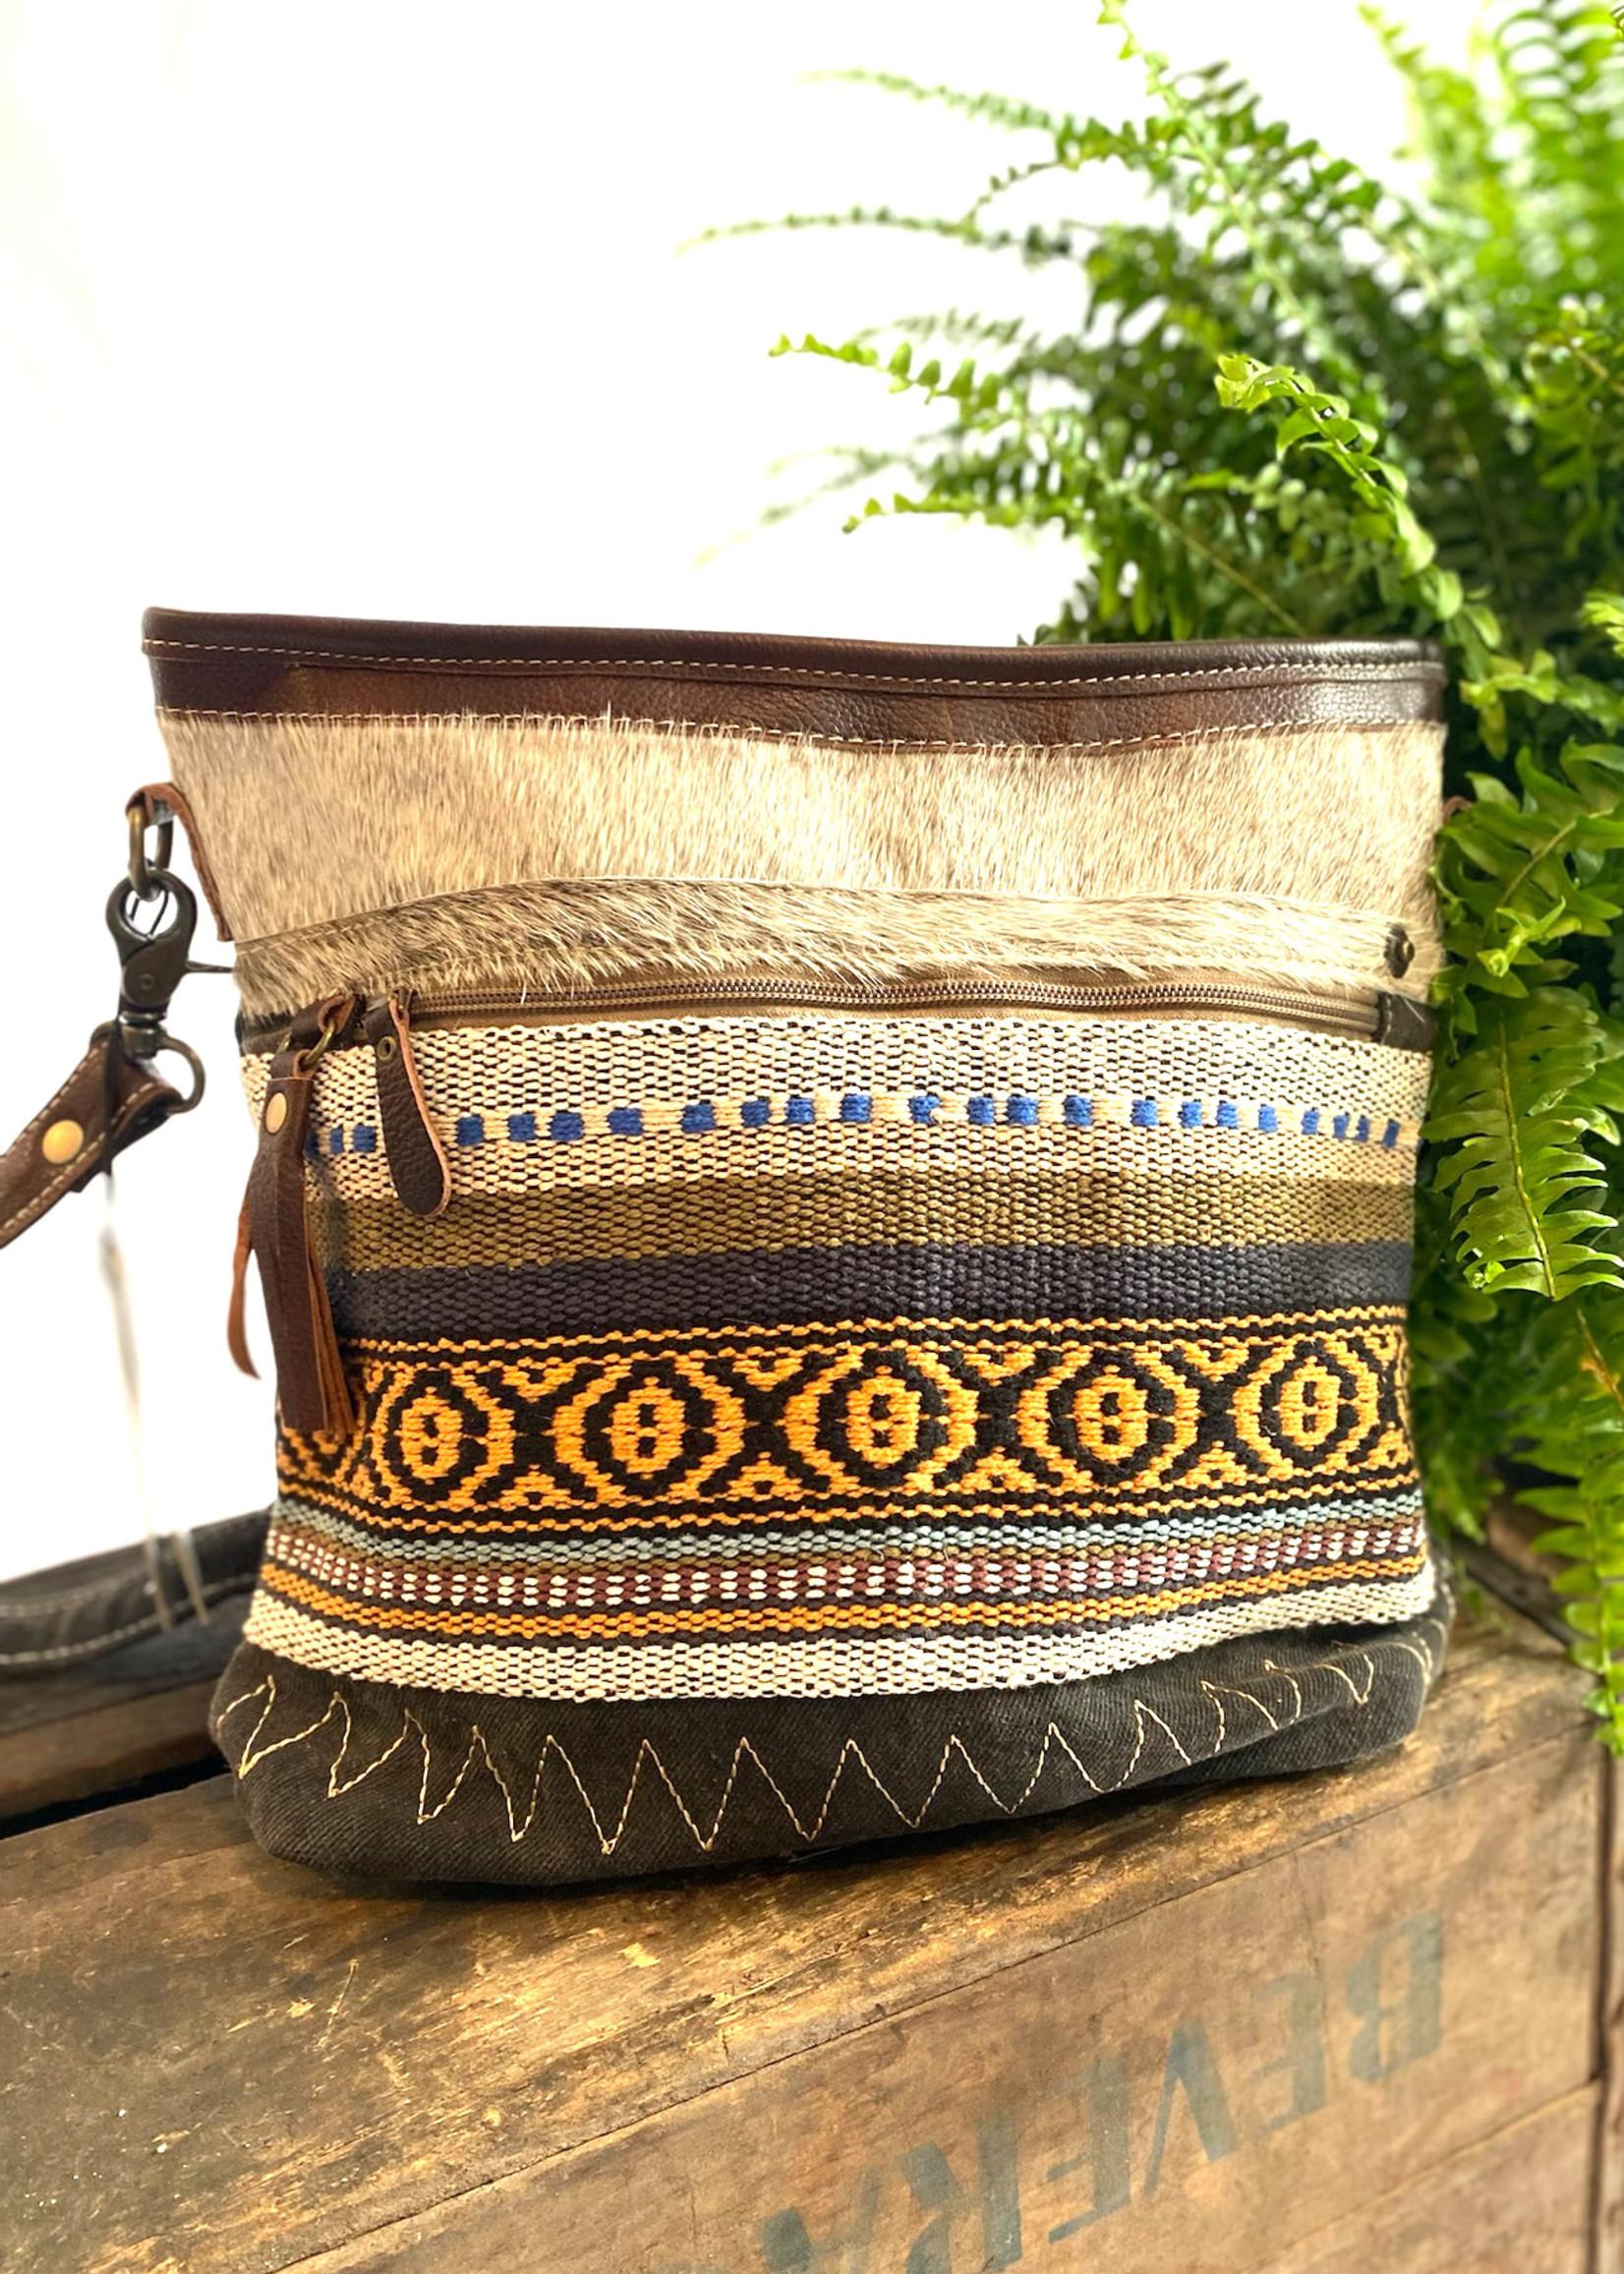 Adaptable Shoulder Bag